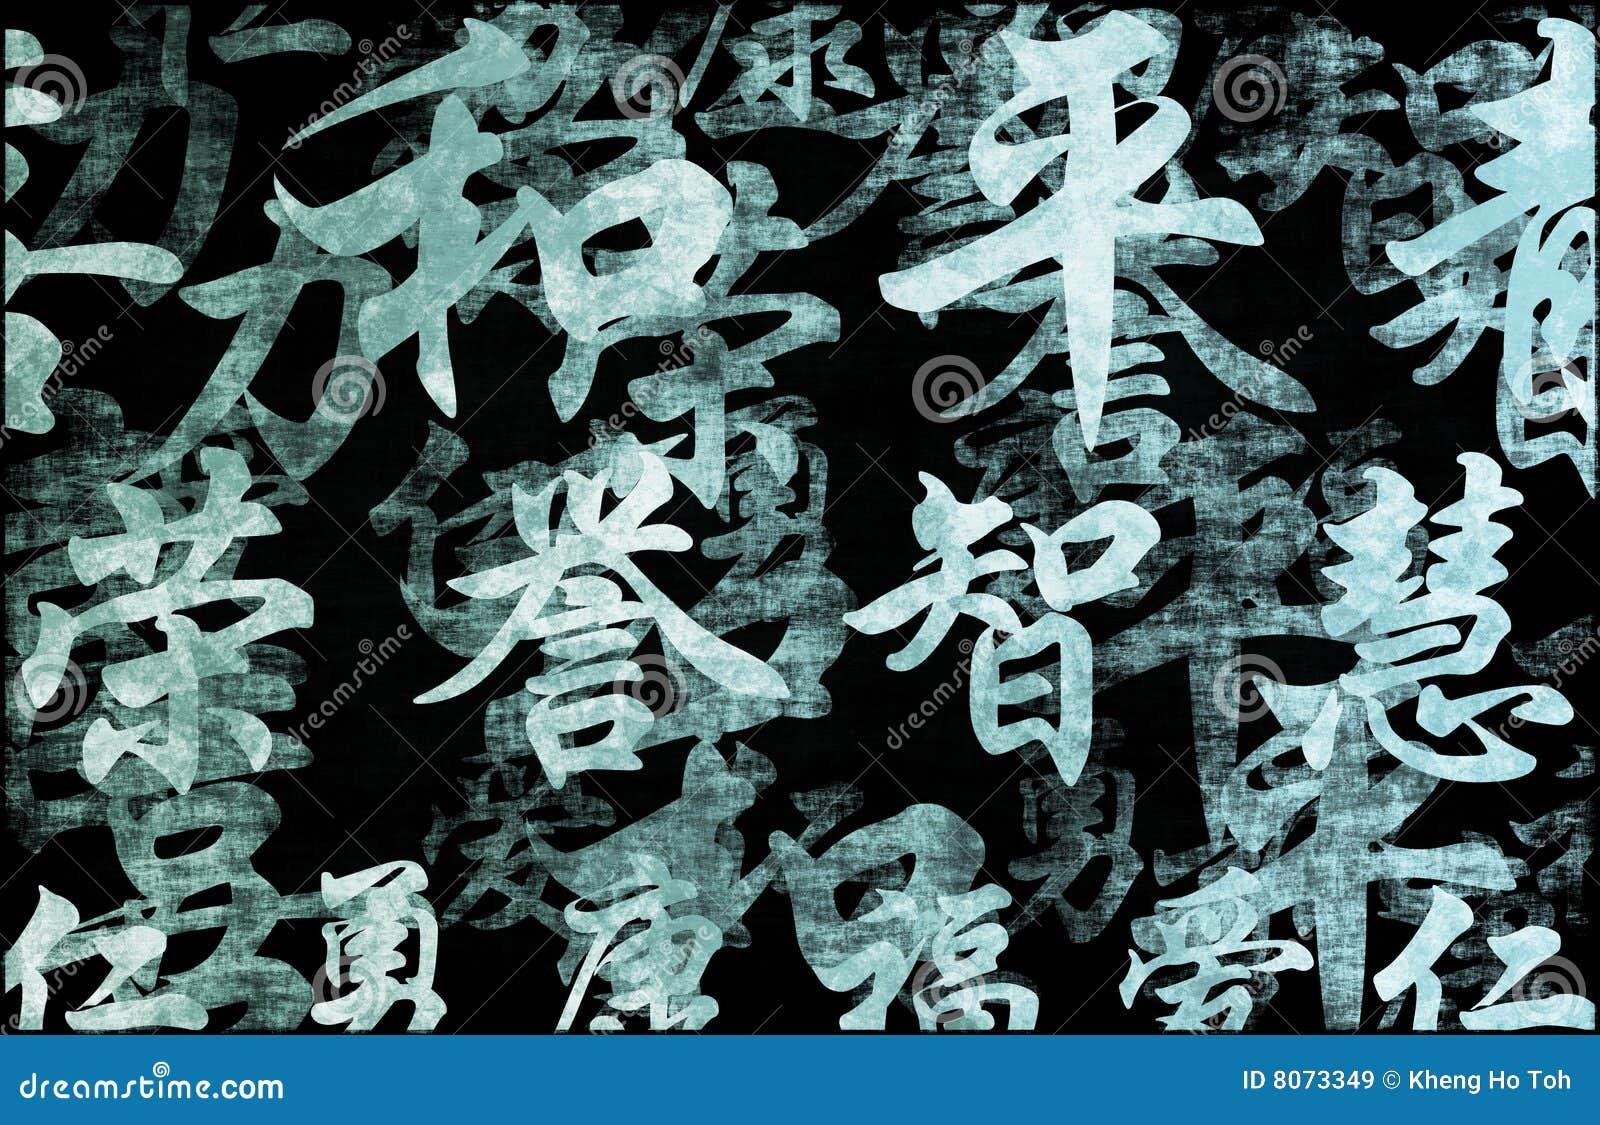 Chinese Writing Calligraphy Background Royalty Free Stock Images  Image 8073349